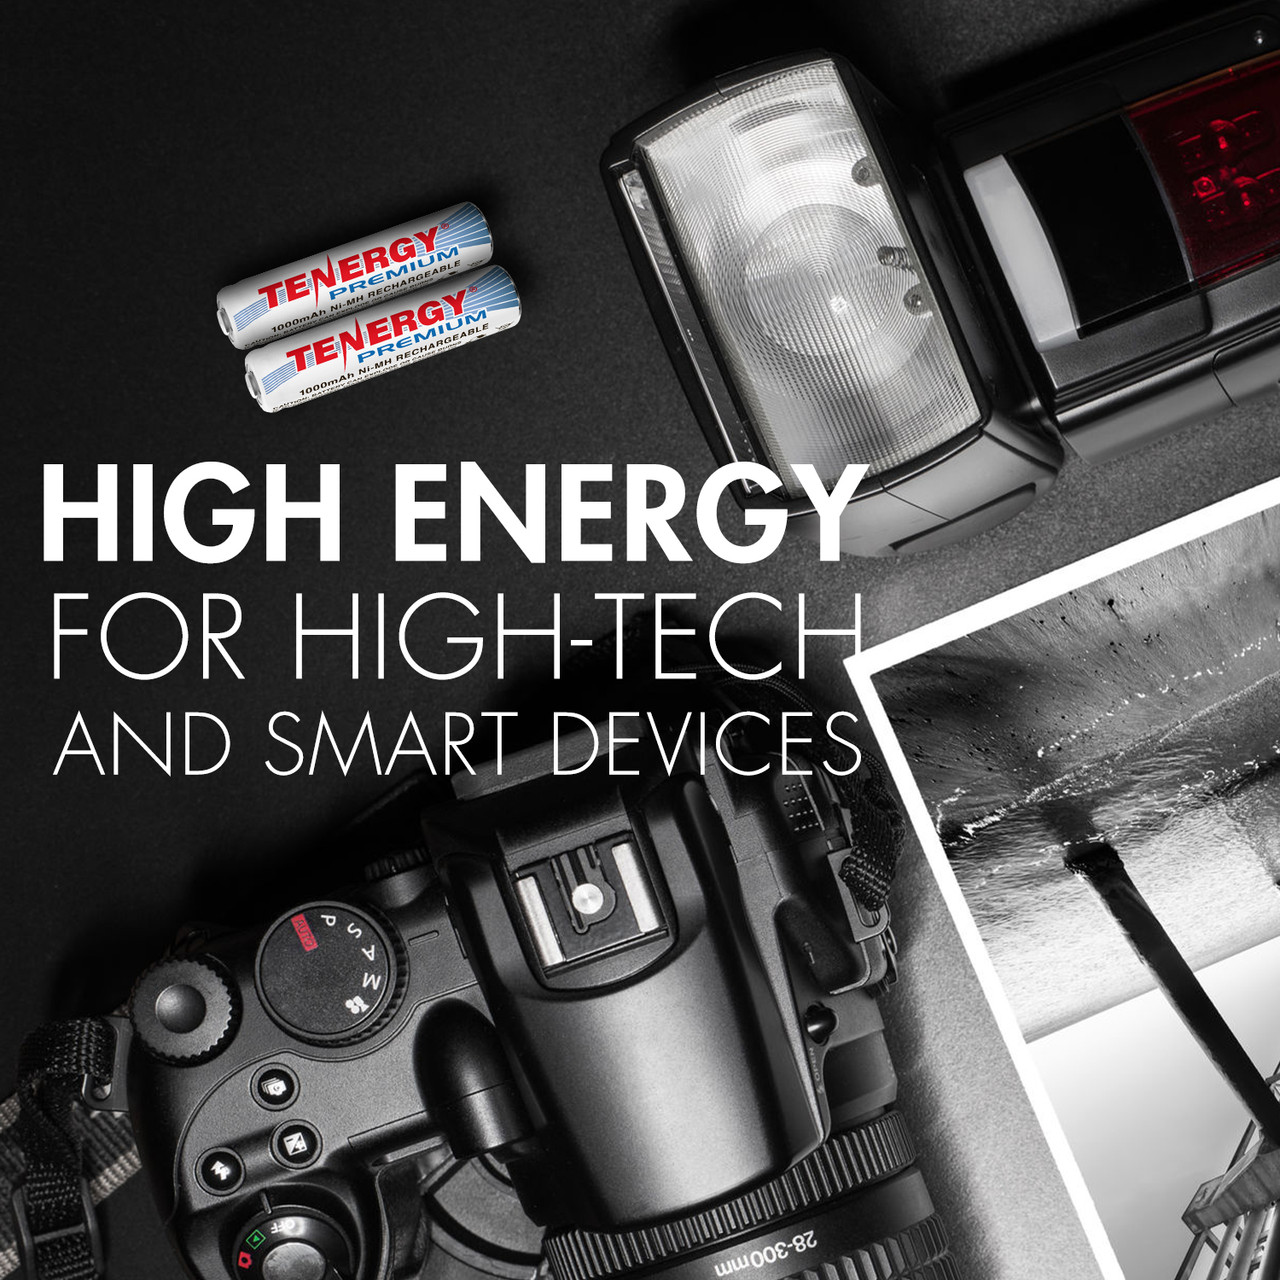 Combo: 60 pcs Tenergy Premium AAA 1000mAh NiMH Rechargeable Batteries